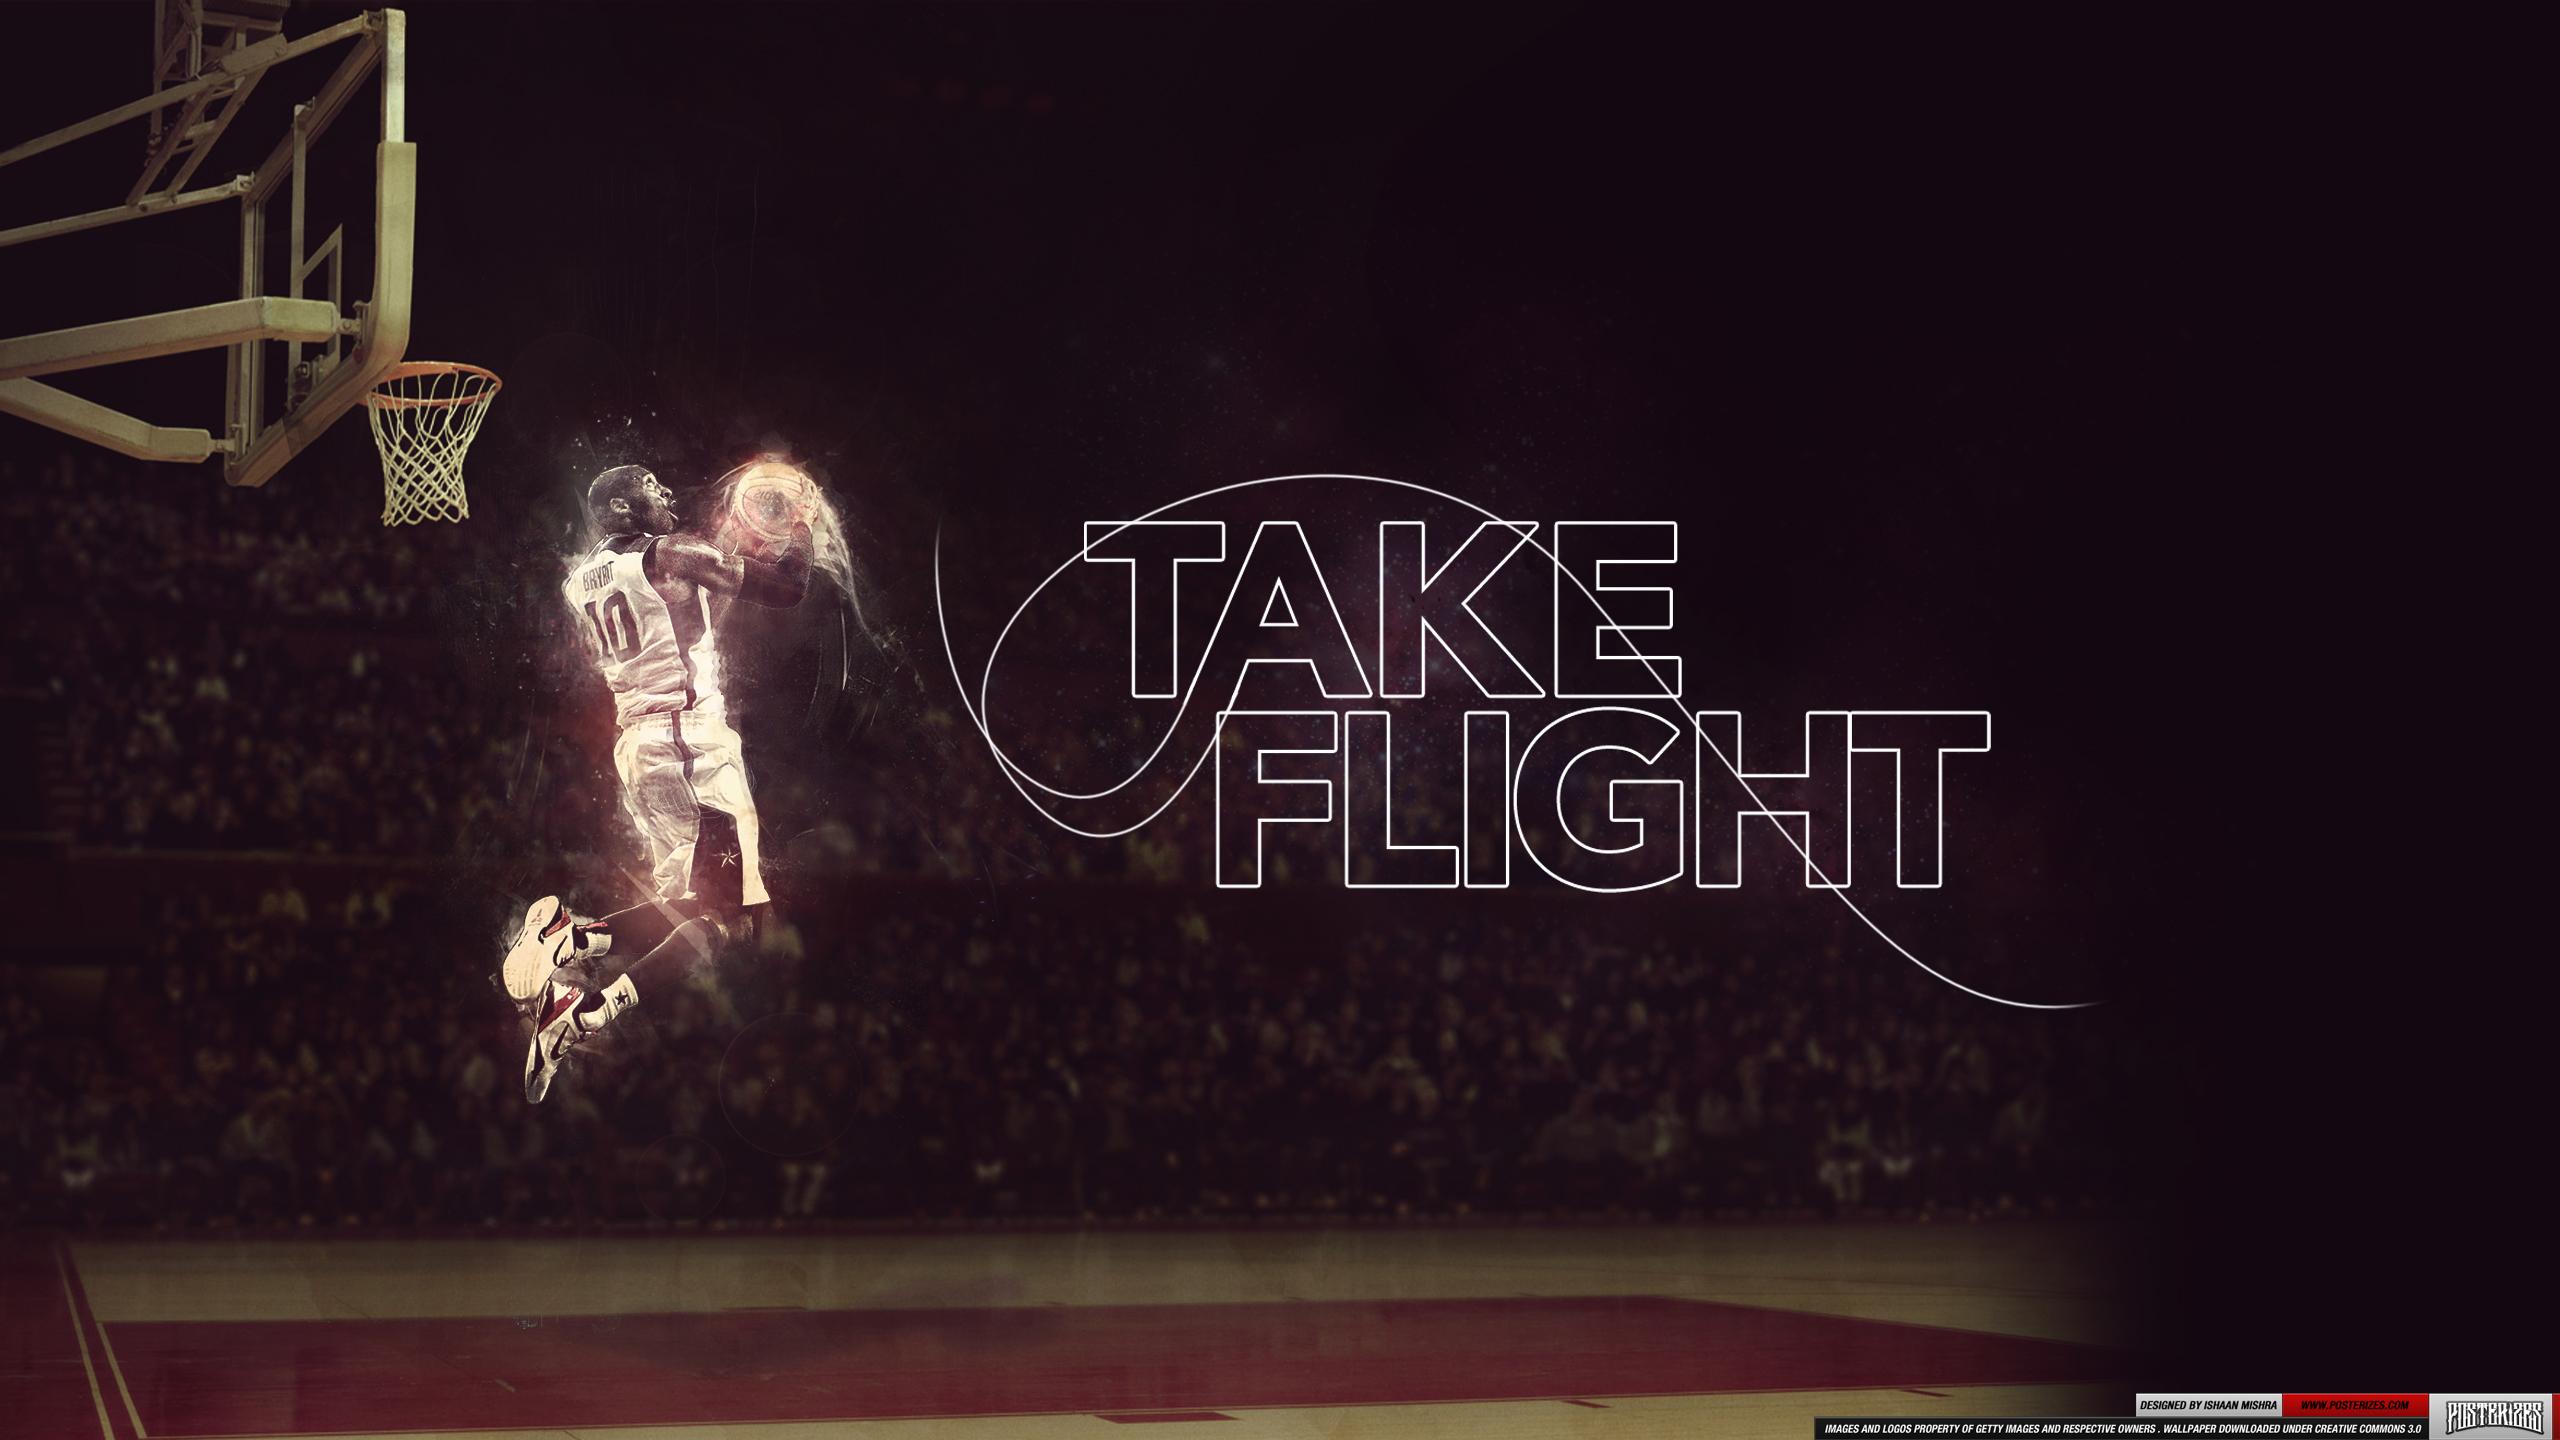 Air Jordan Flight Logo Wallpaper Kobe bryant take flight 2560x1440